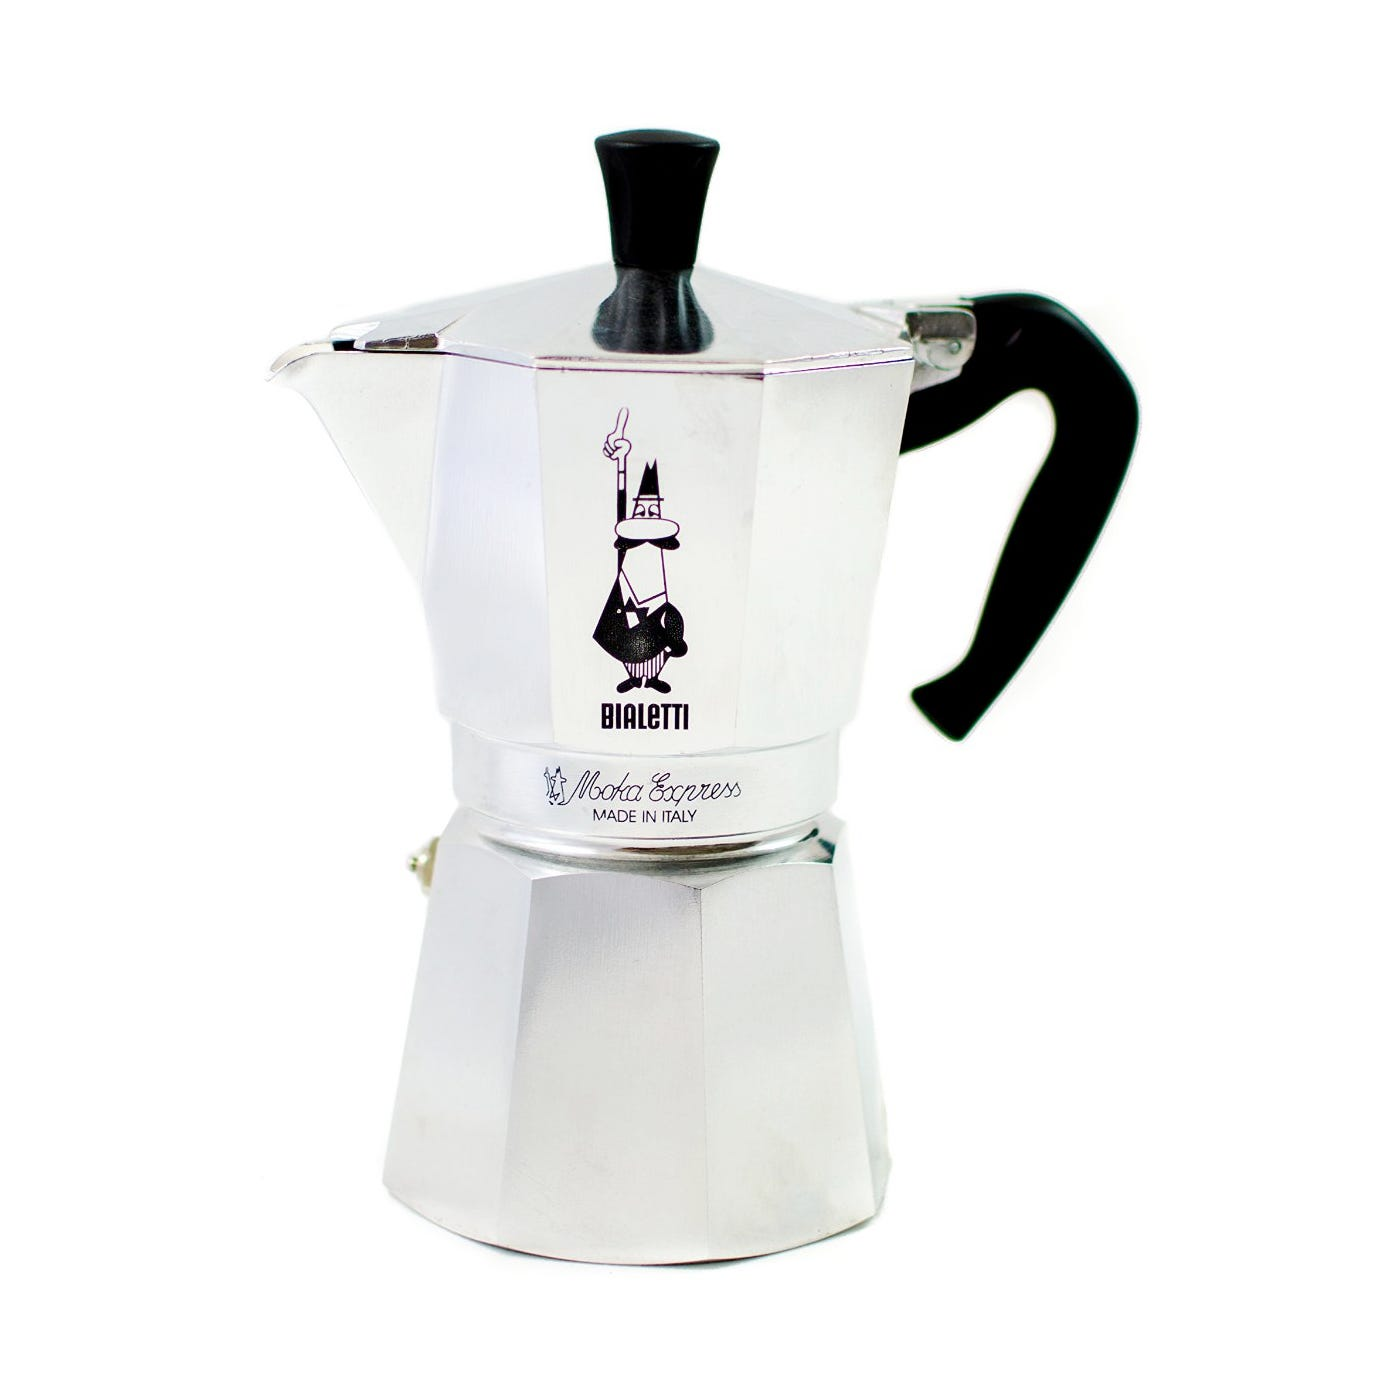 Moka Express Coffee Maker